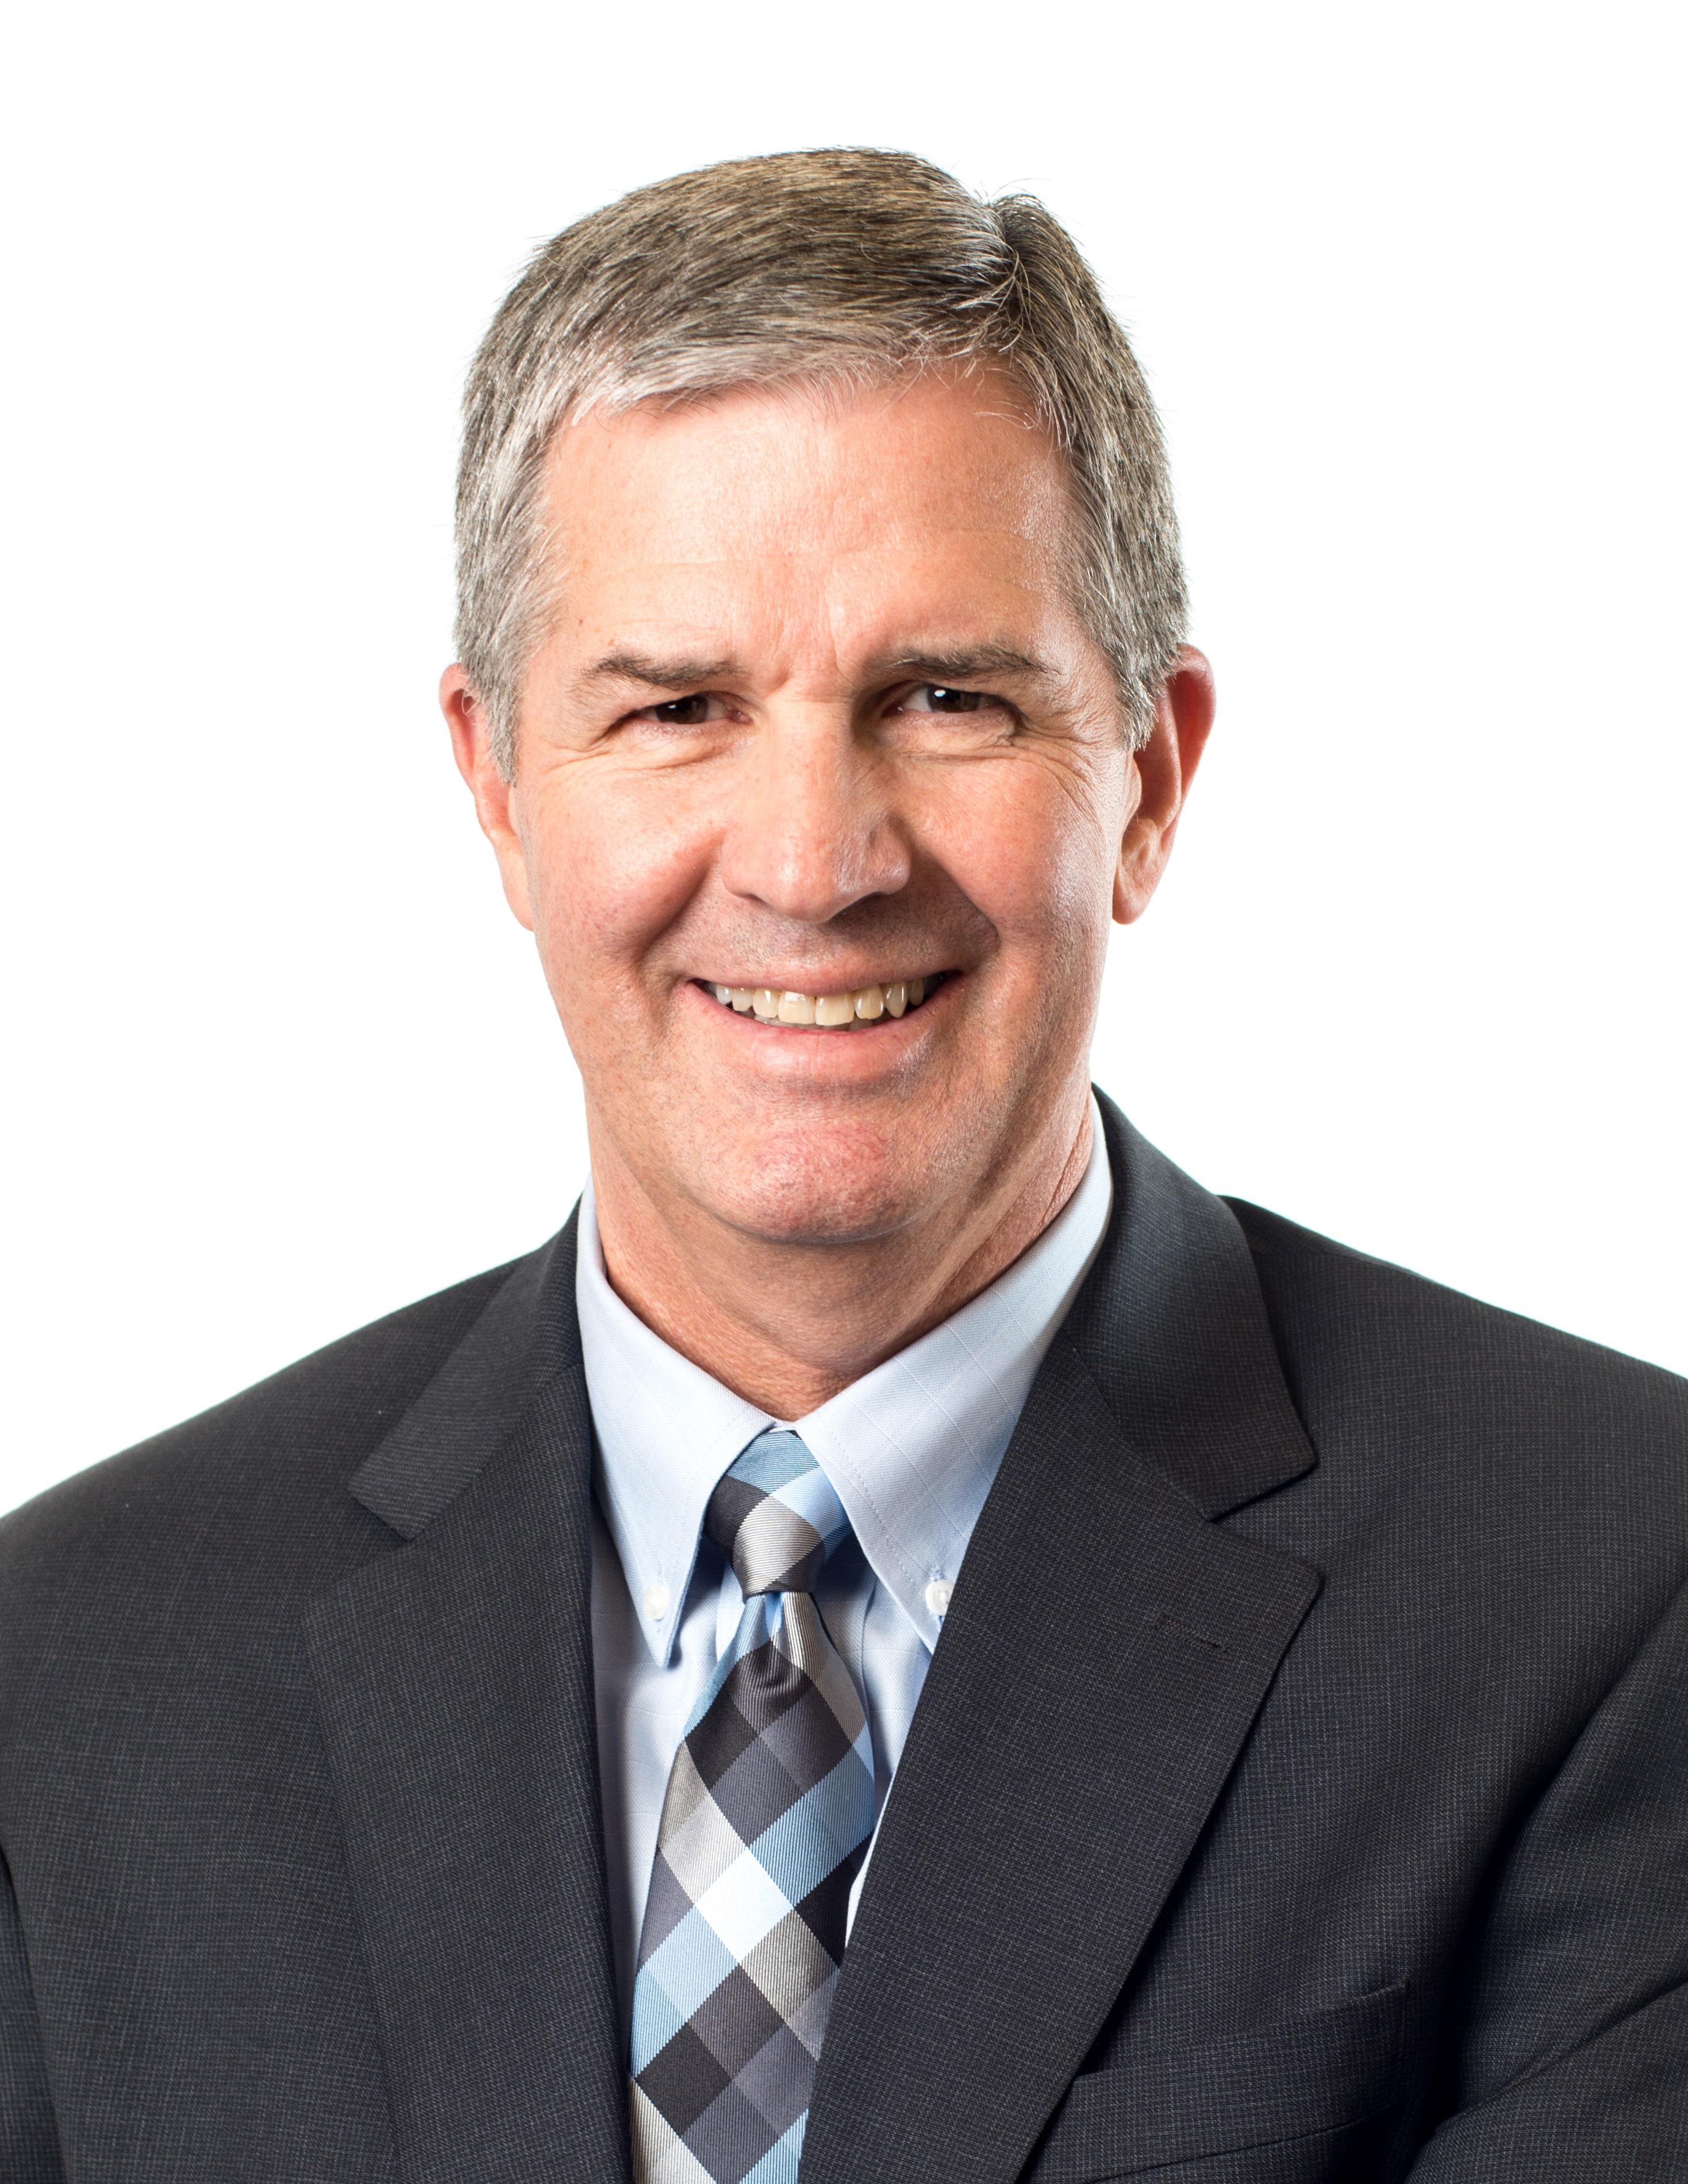 Brad Nielson, THE BUCKNER COMPANY